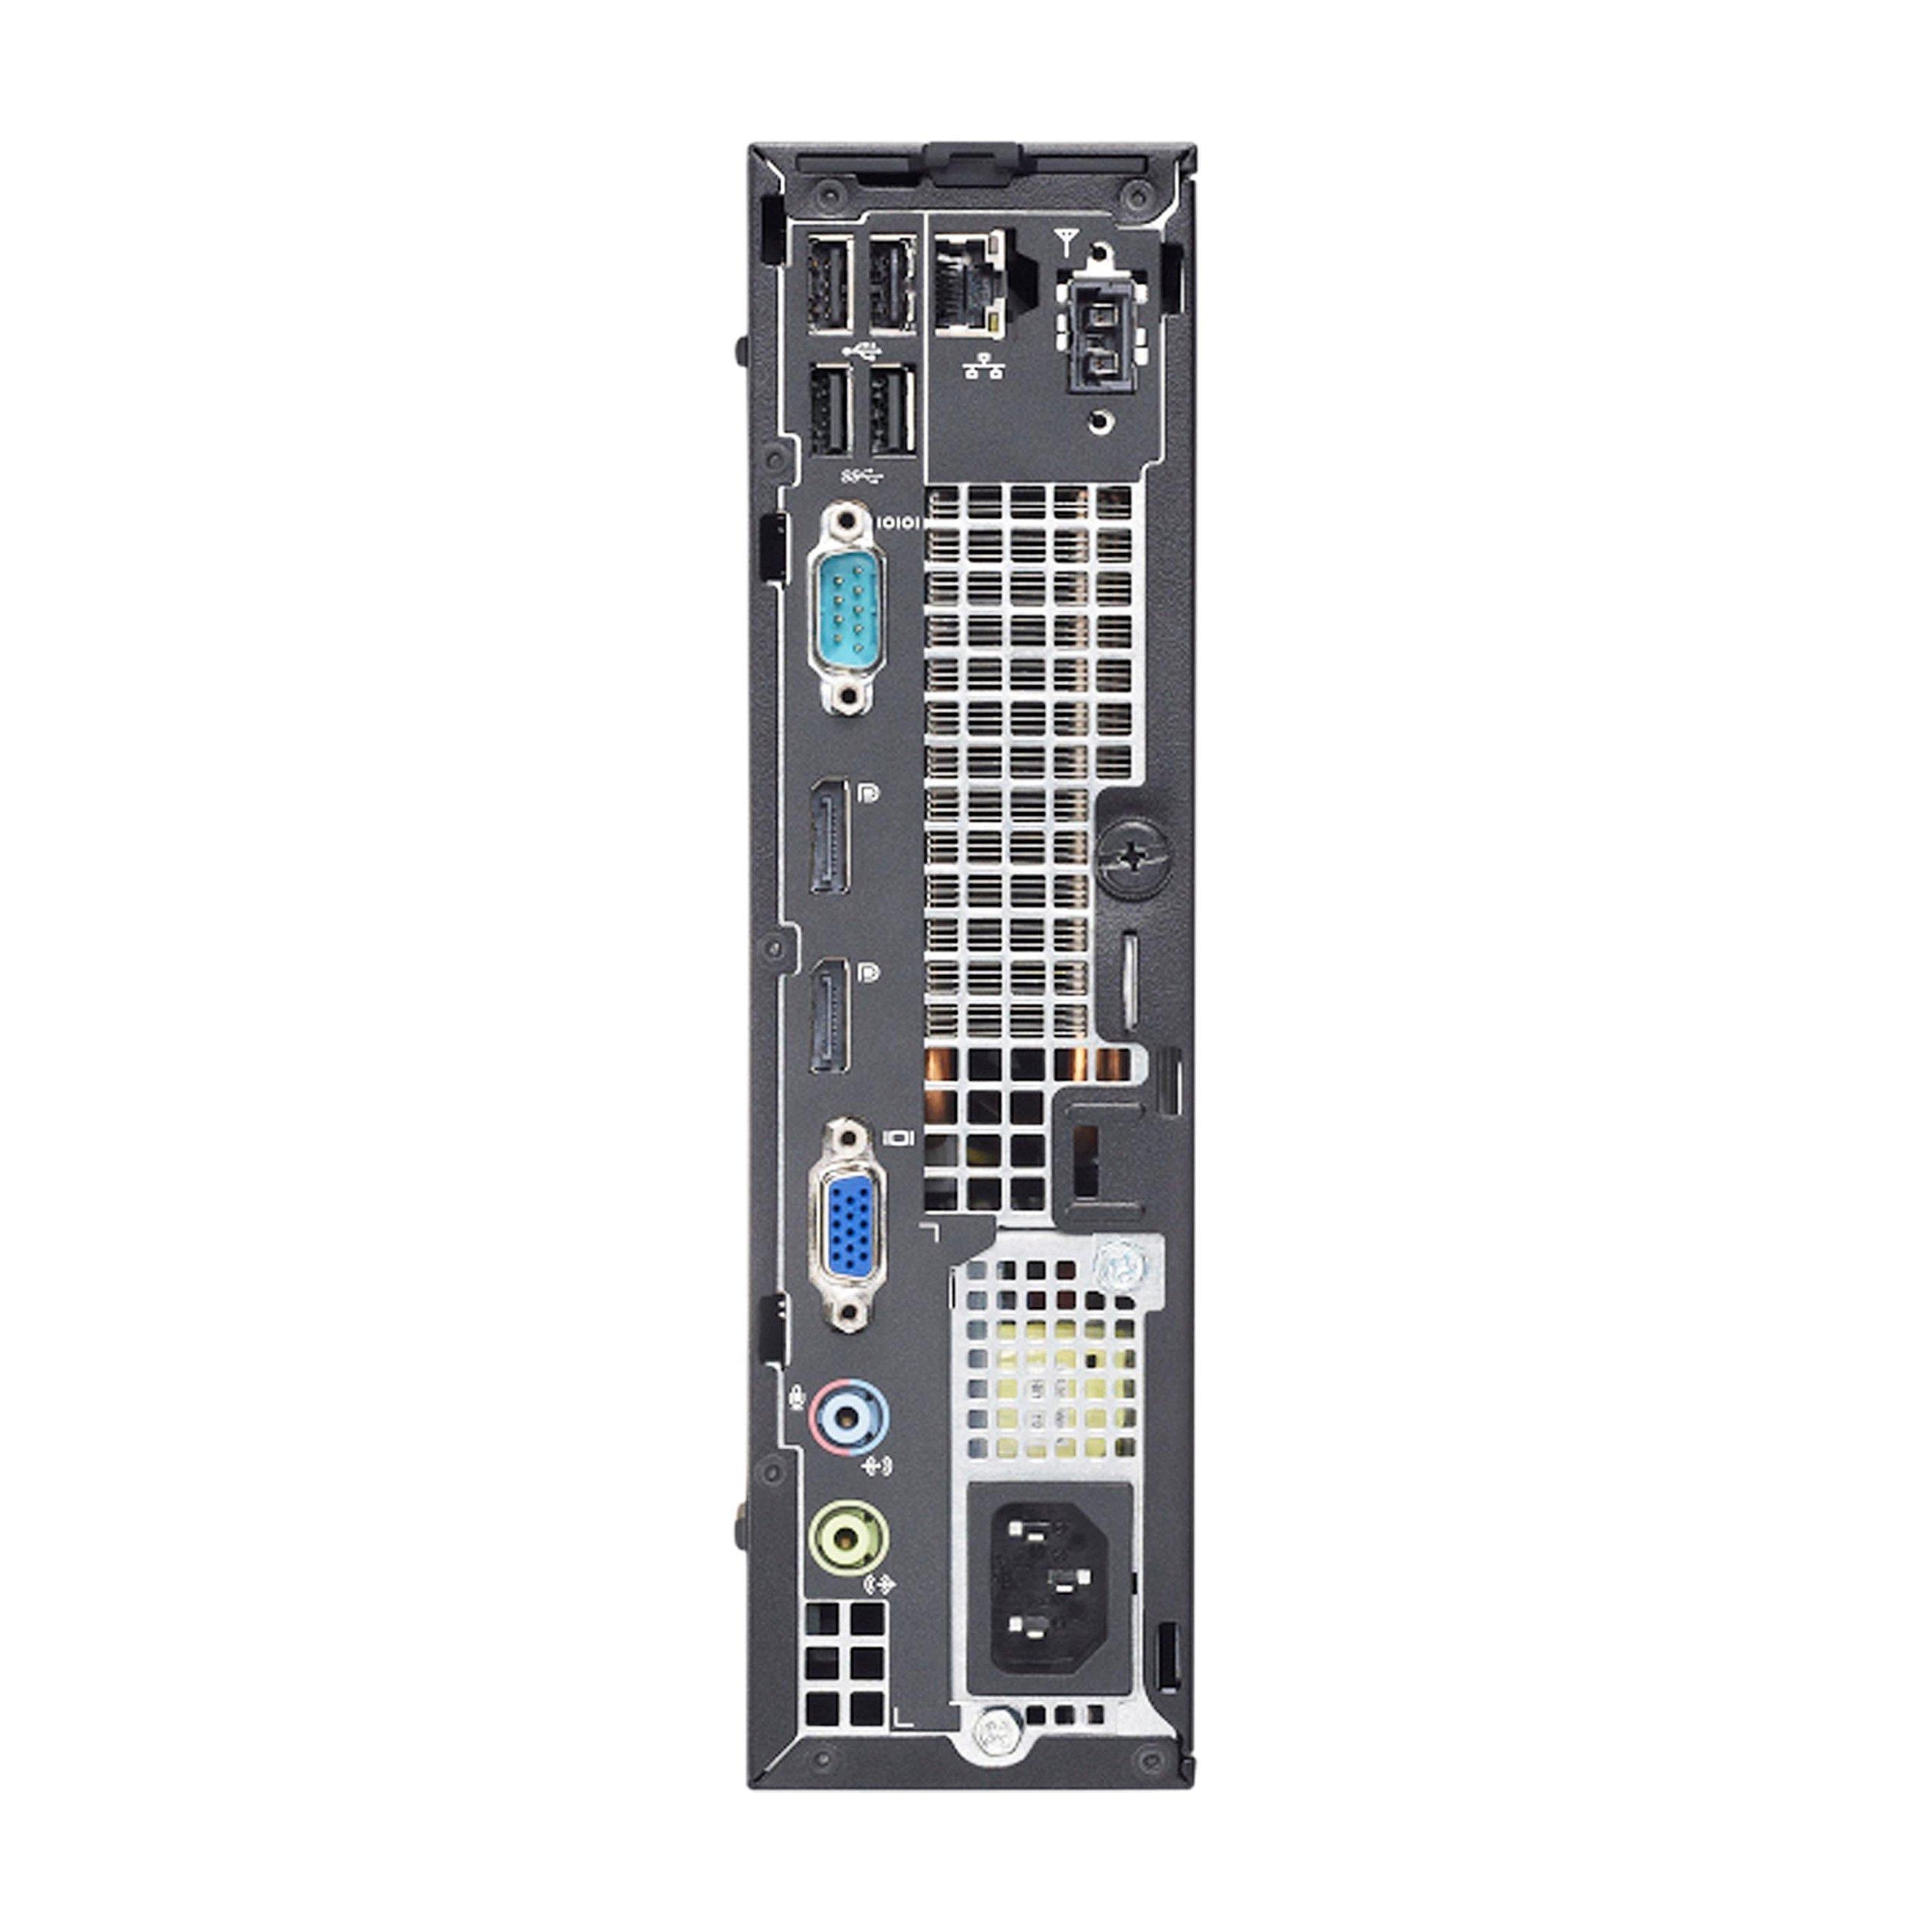 2018 Dell Optiplex 7010 Ultra Small Form Factor Desktop Computer (Intel Core i3-3220 3.3GHz,4GB DDR3 RAM,500GB,DVD-ROM,Windows 10 Pro 64-Bit) (Certified Refurbished) by Dell (Image #4)